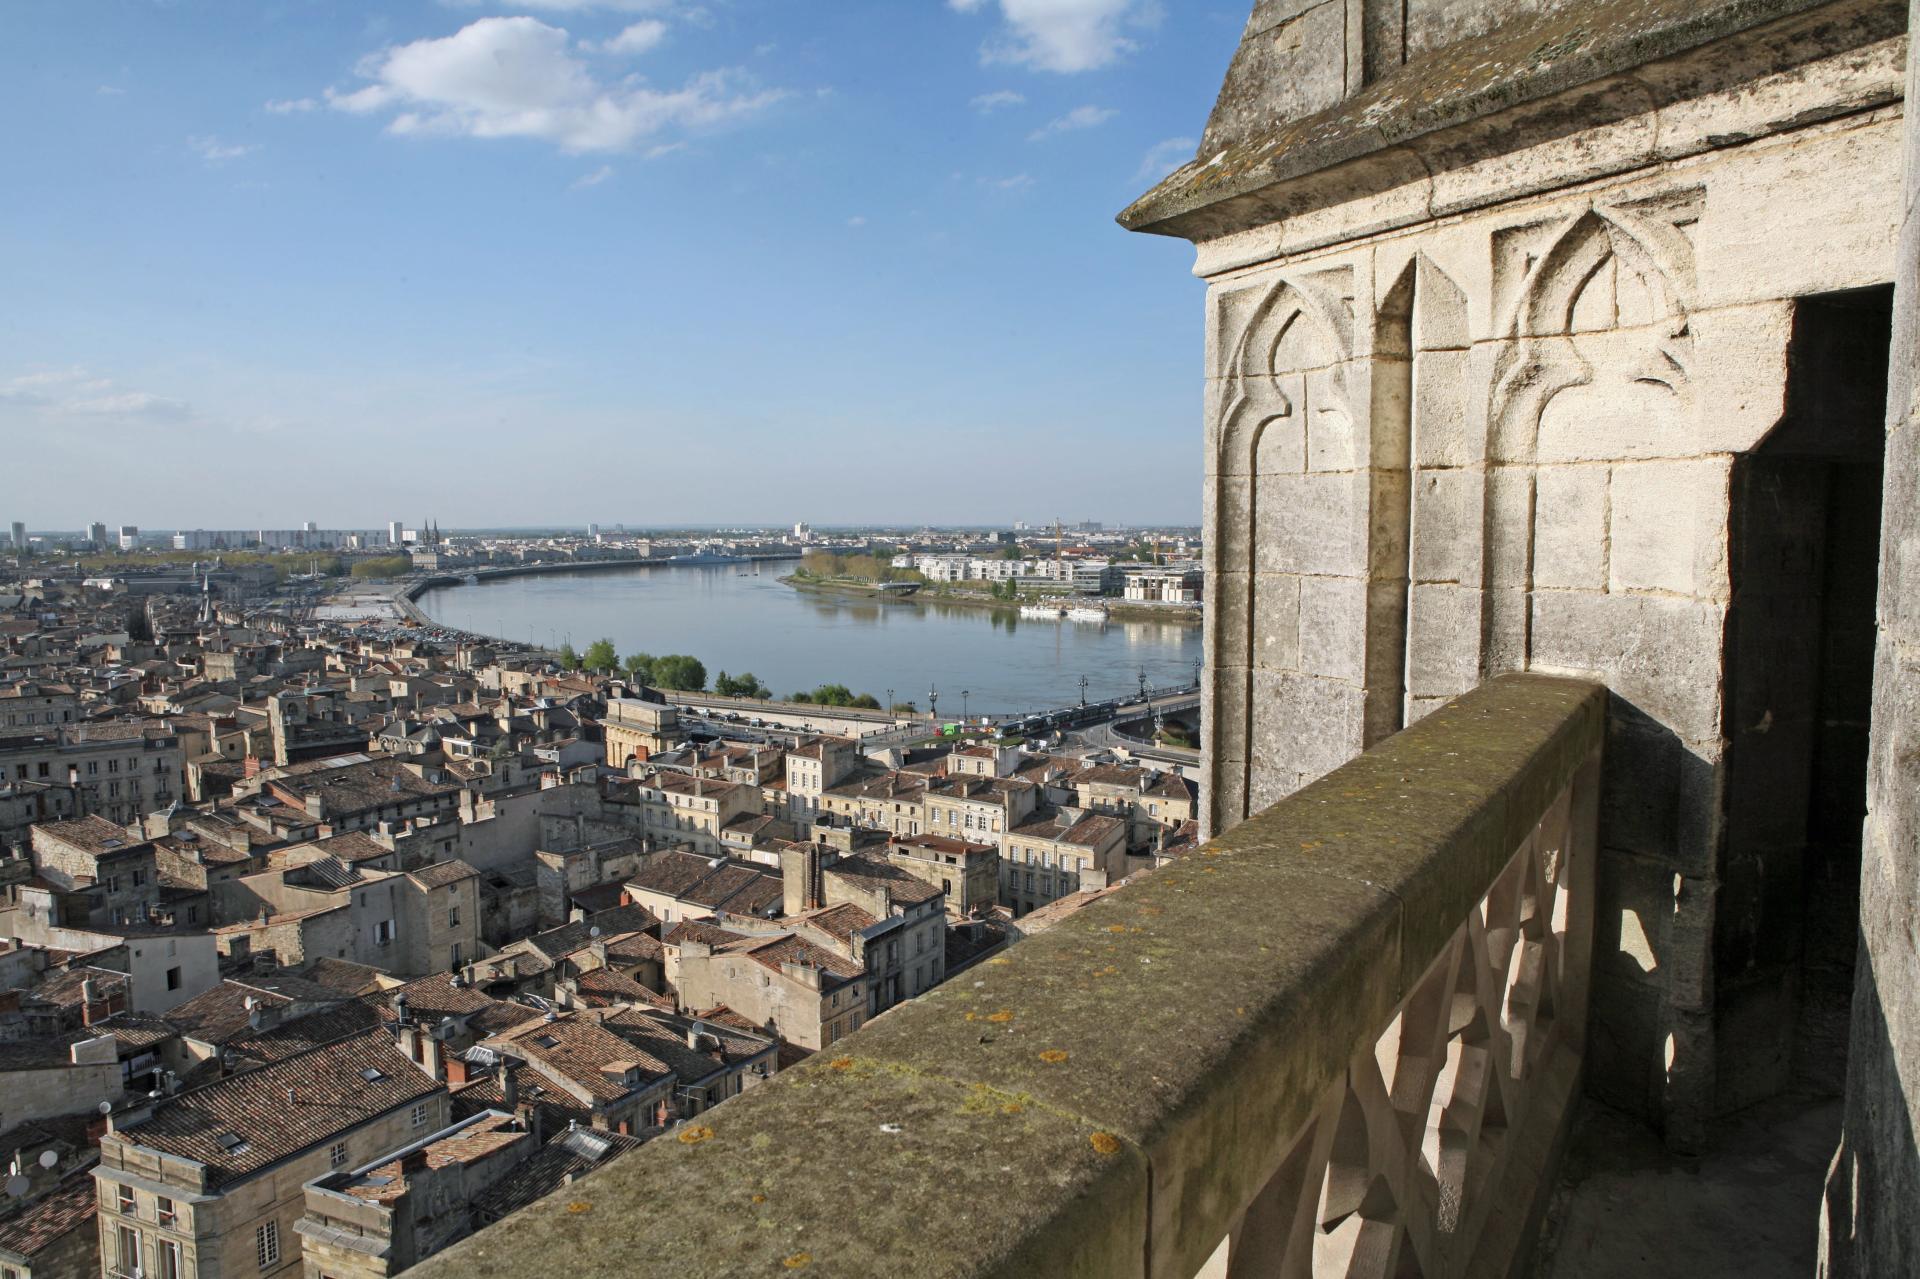 Saint-Michel em Bordéus